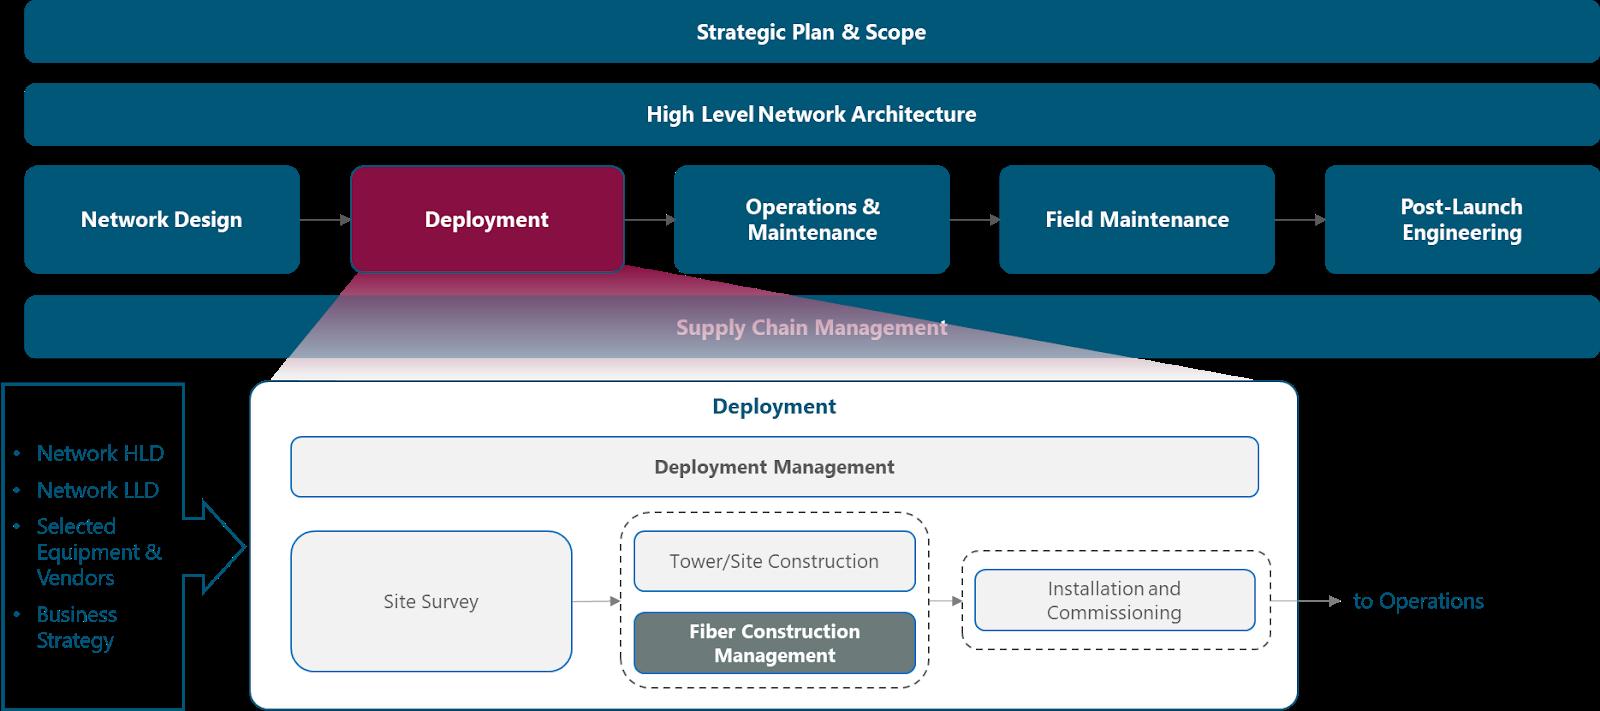 Naas Playbook Deployment Telecom Infra Project